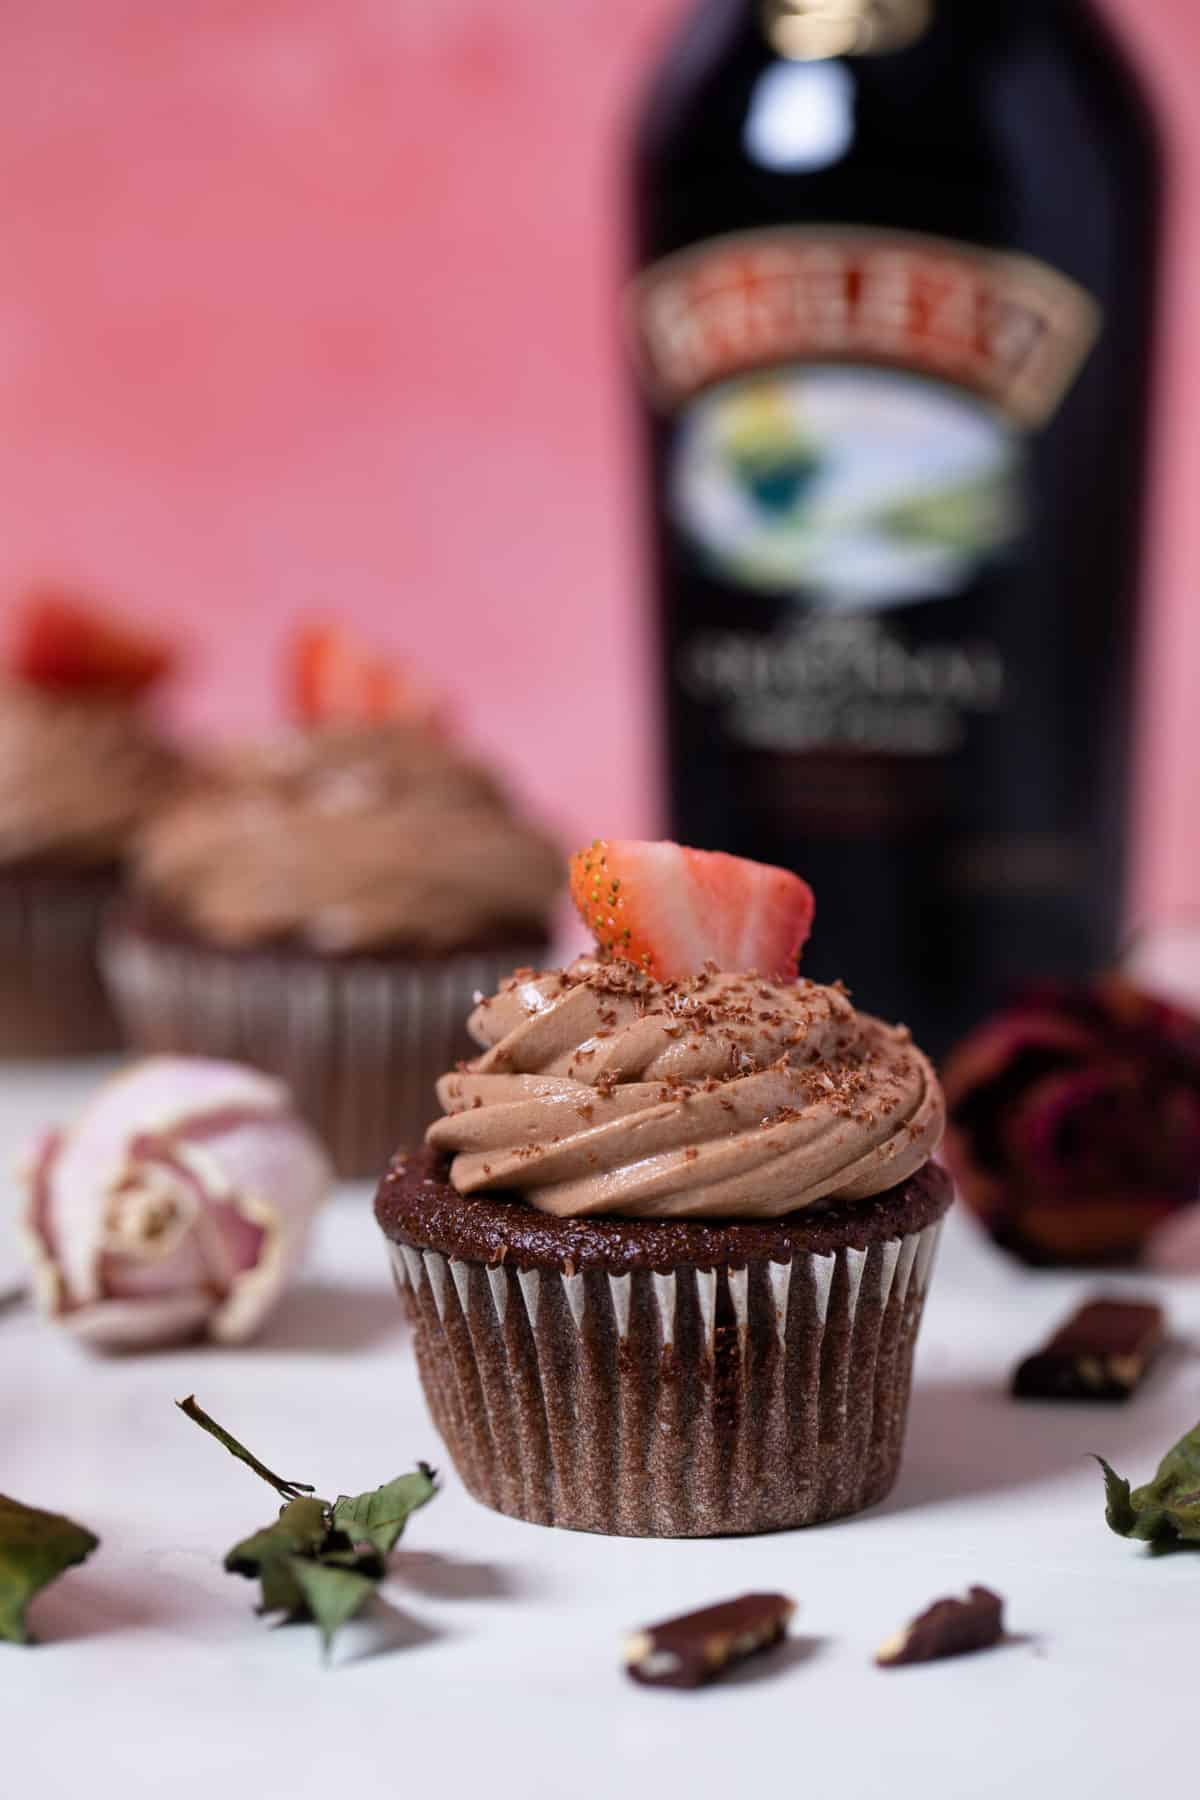 Break Up Bailey's Chocolate Cupcakes